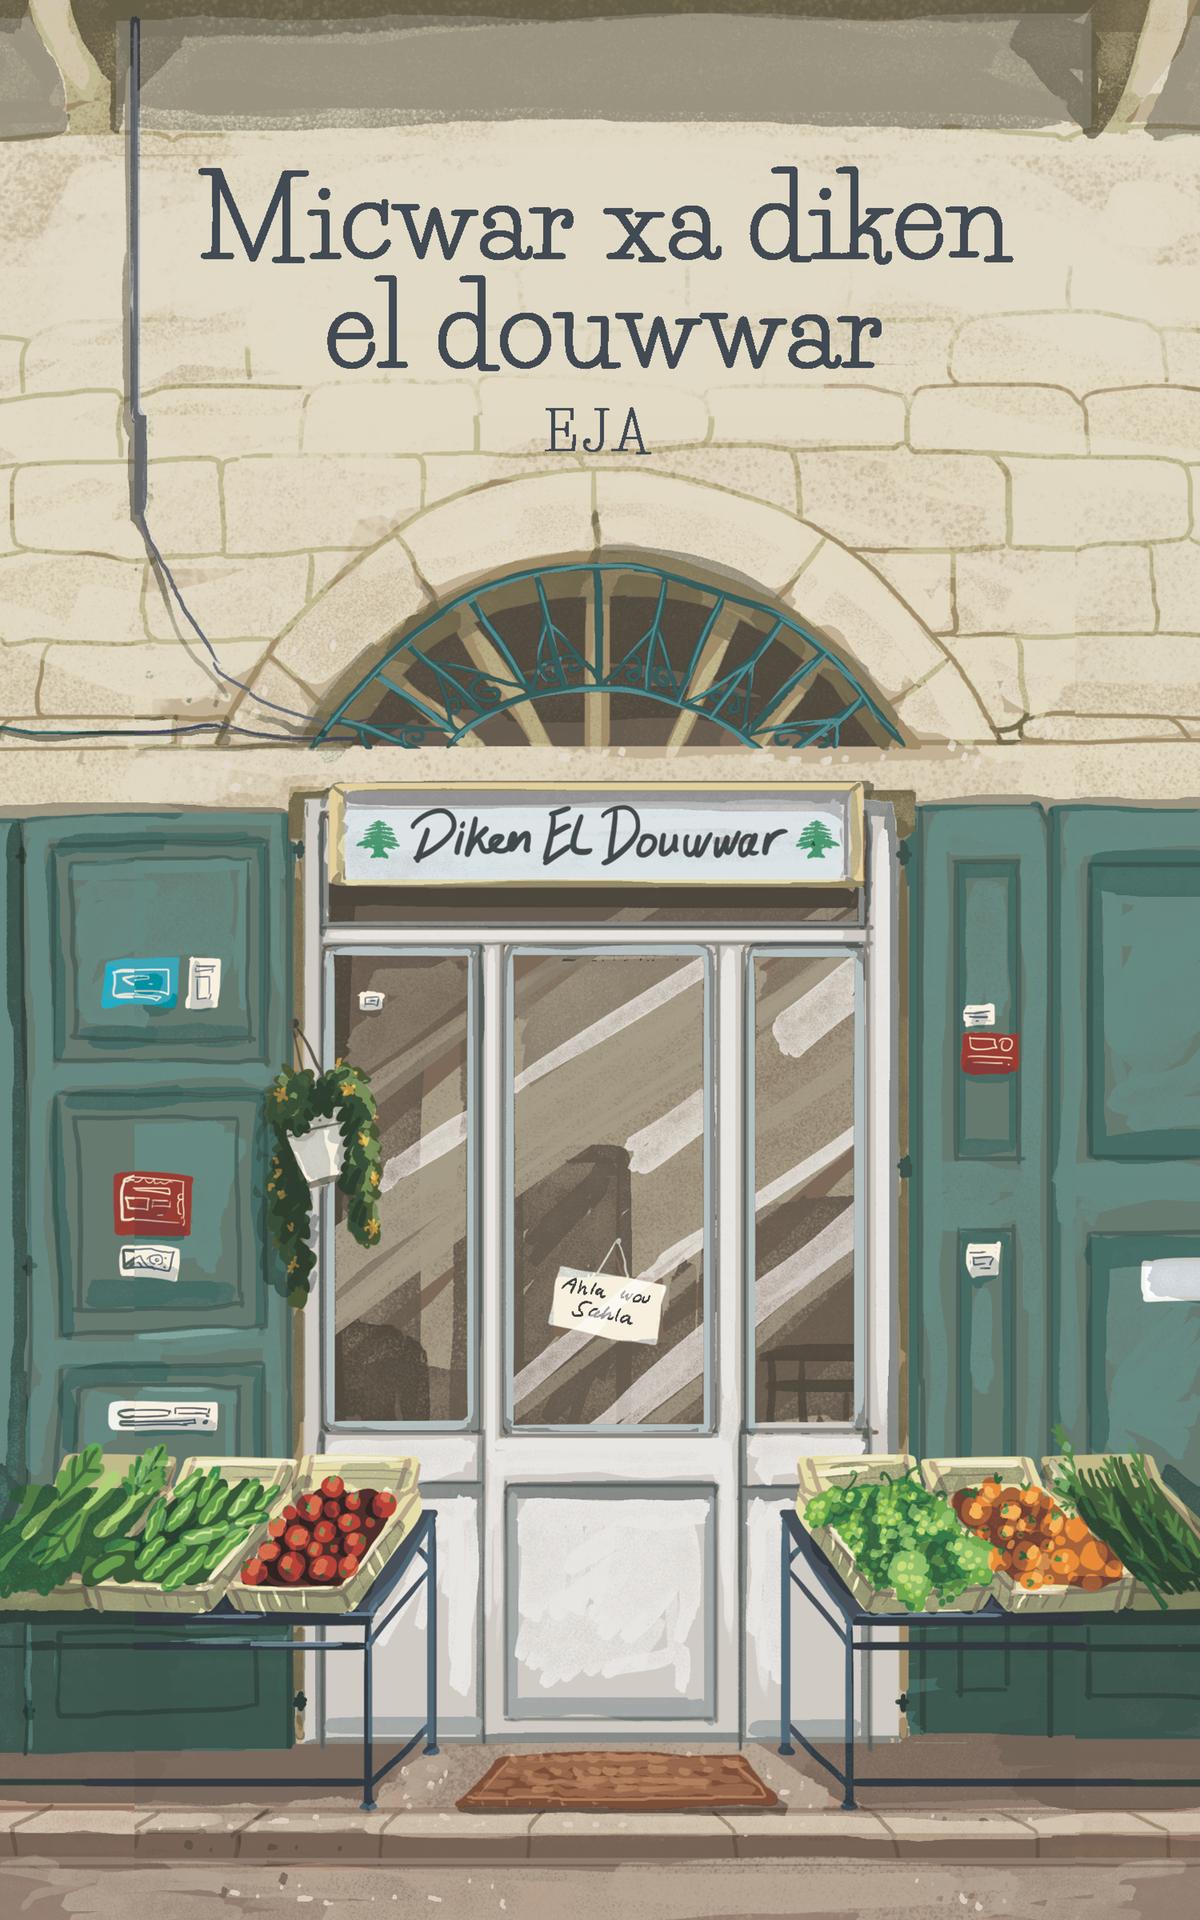 Micwar xa diken el douwwar Children Book's Illustration Part 2